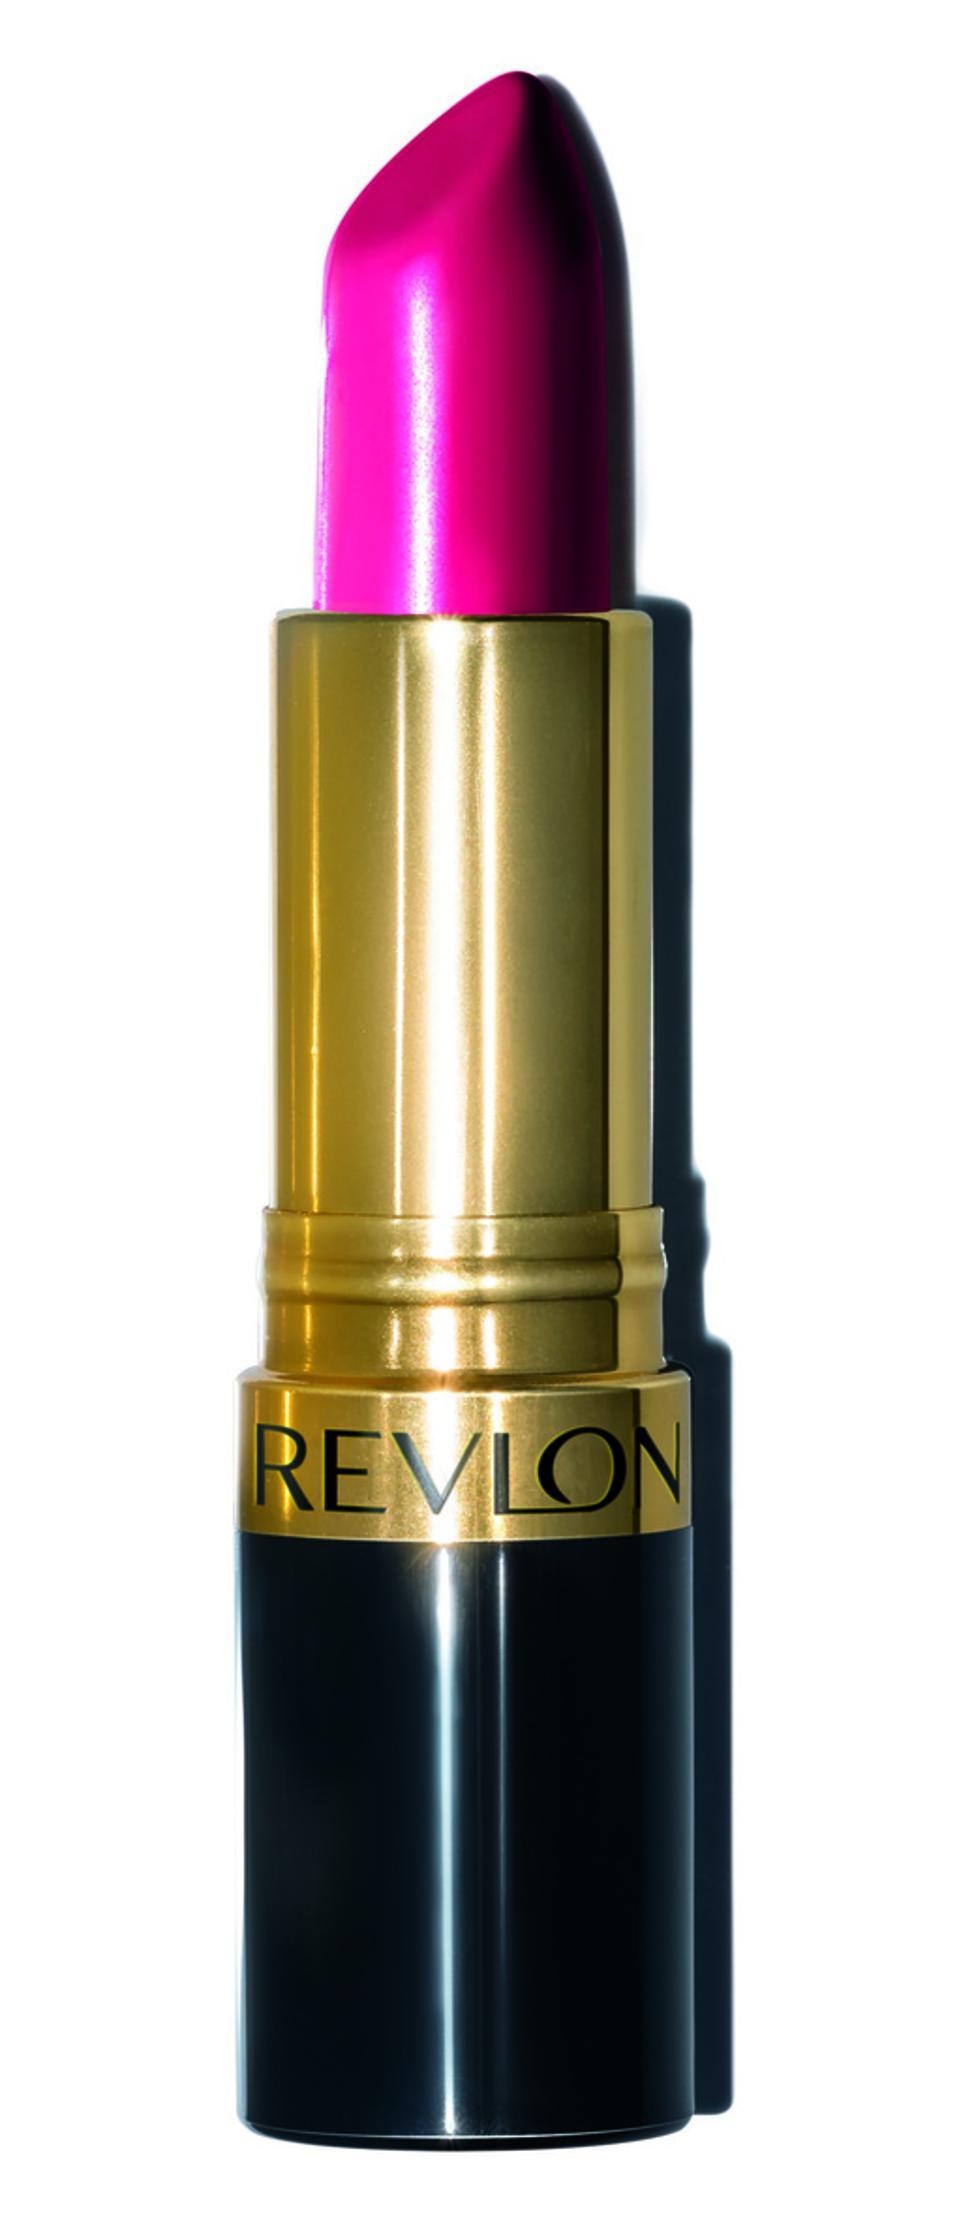 Revlon Super Lustrous Lipstick in Cherries in the Snow